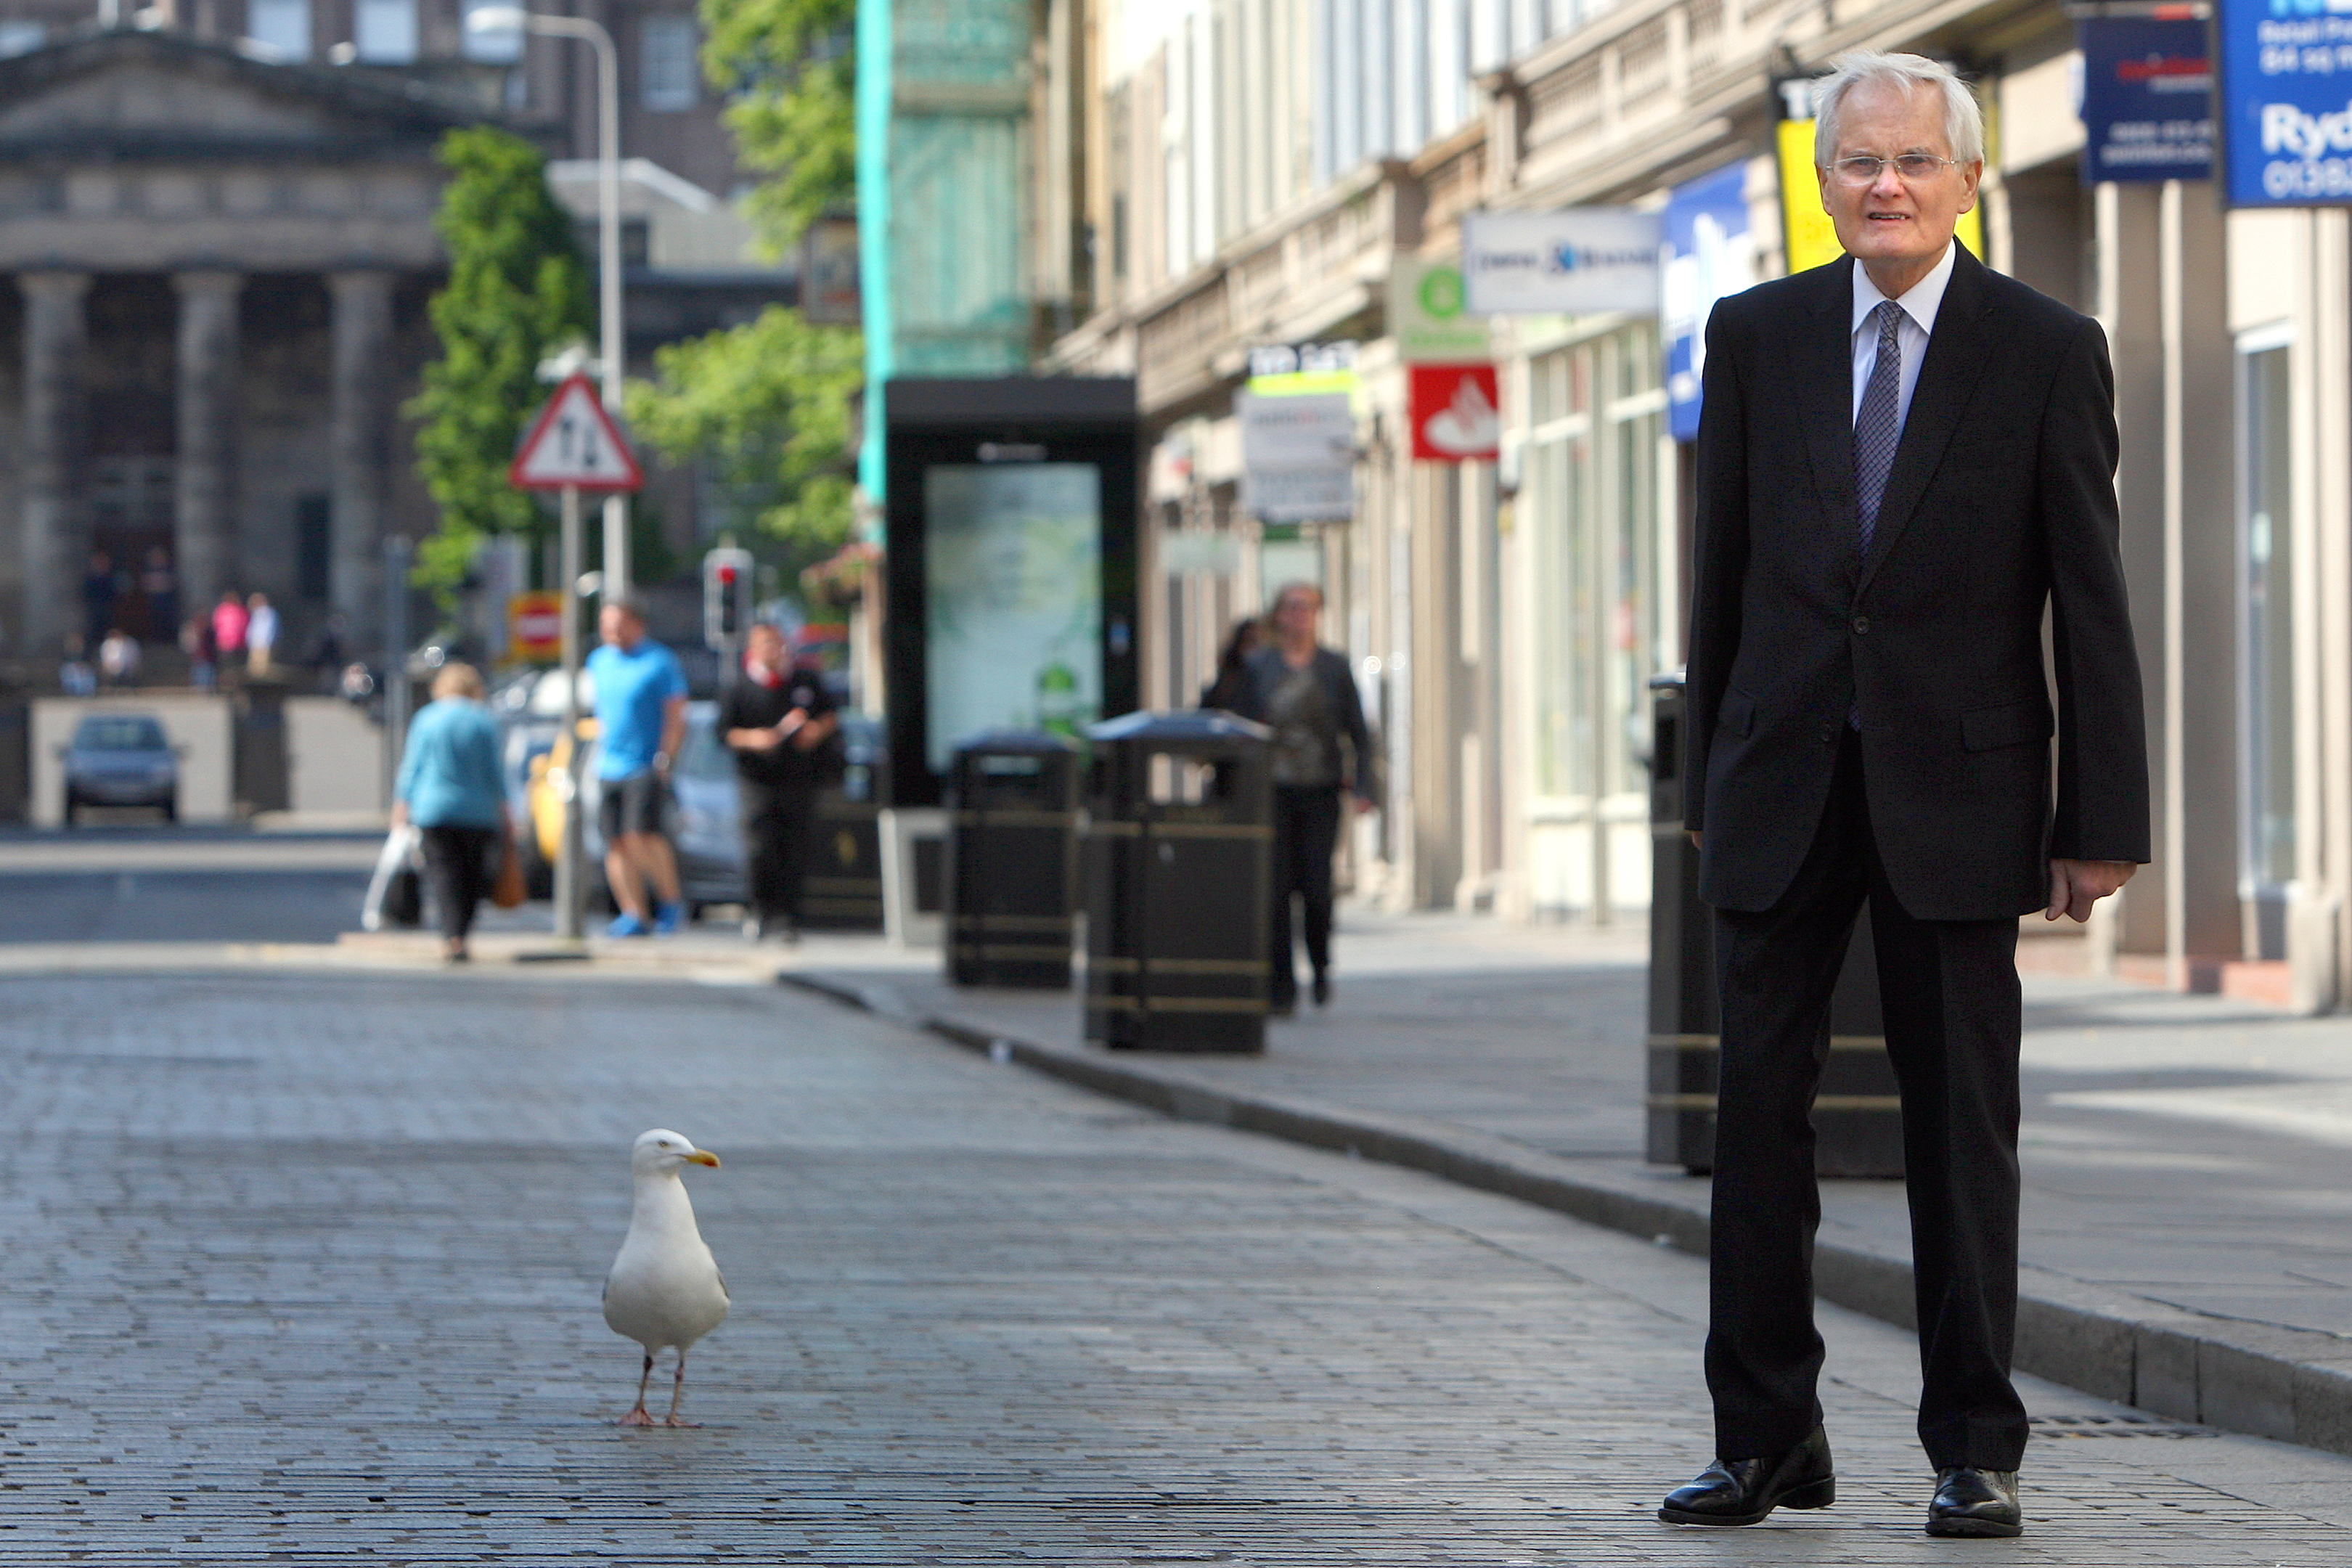 Mr Borthwick has seen an increase in gulls around Dundee.